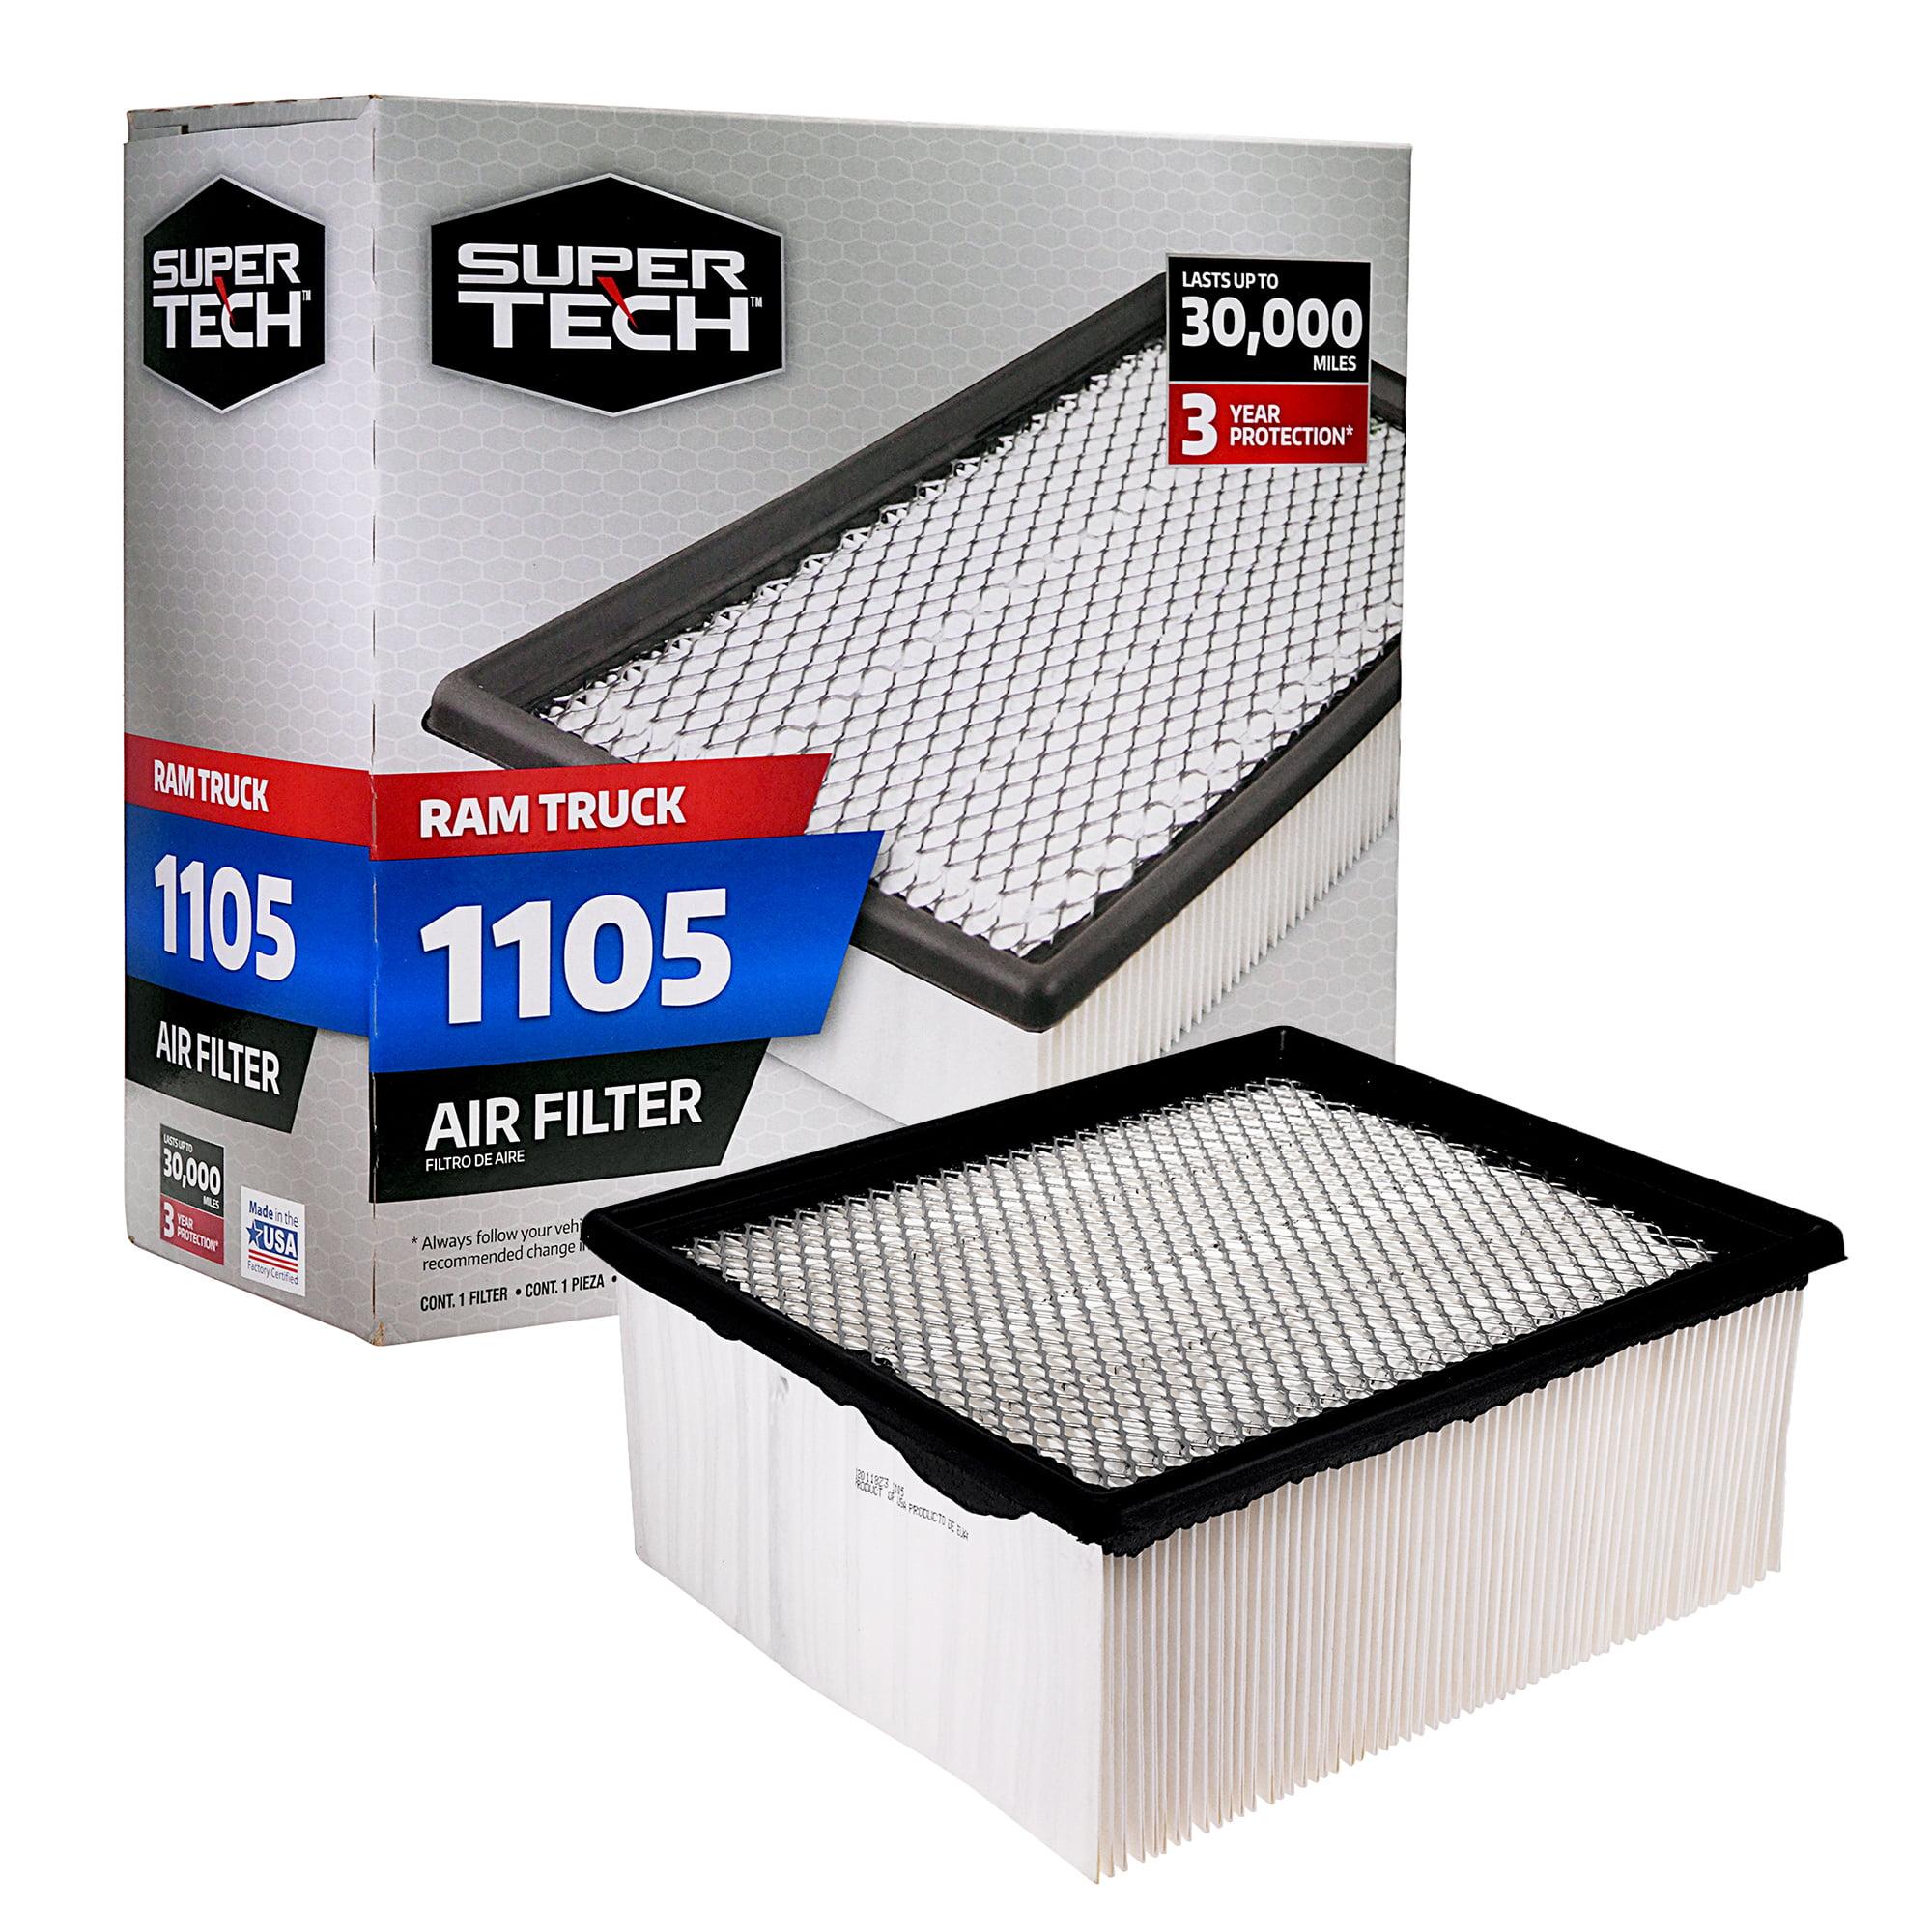 SuperTech 1105 Engine Air Filter, Replacement Filter for Chrysler or Ram Truck